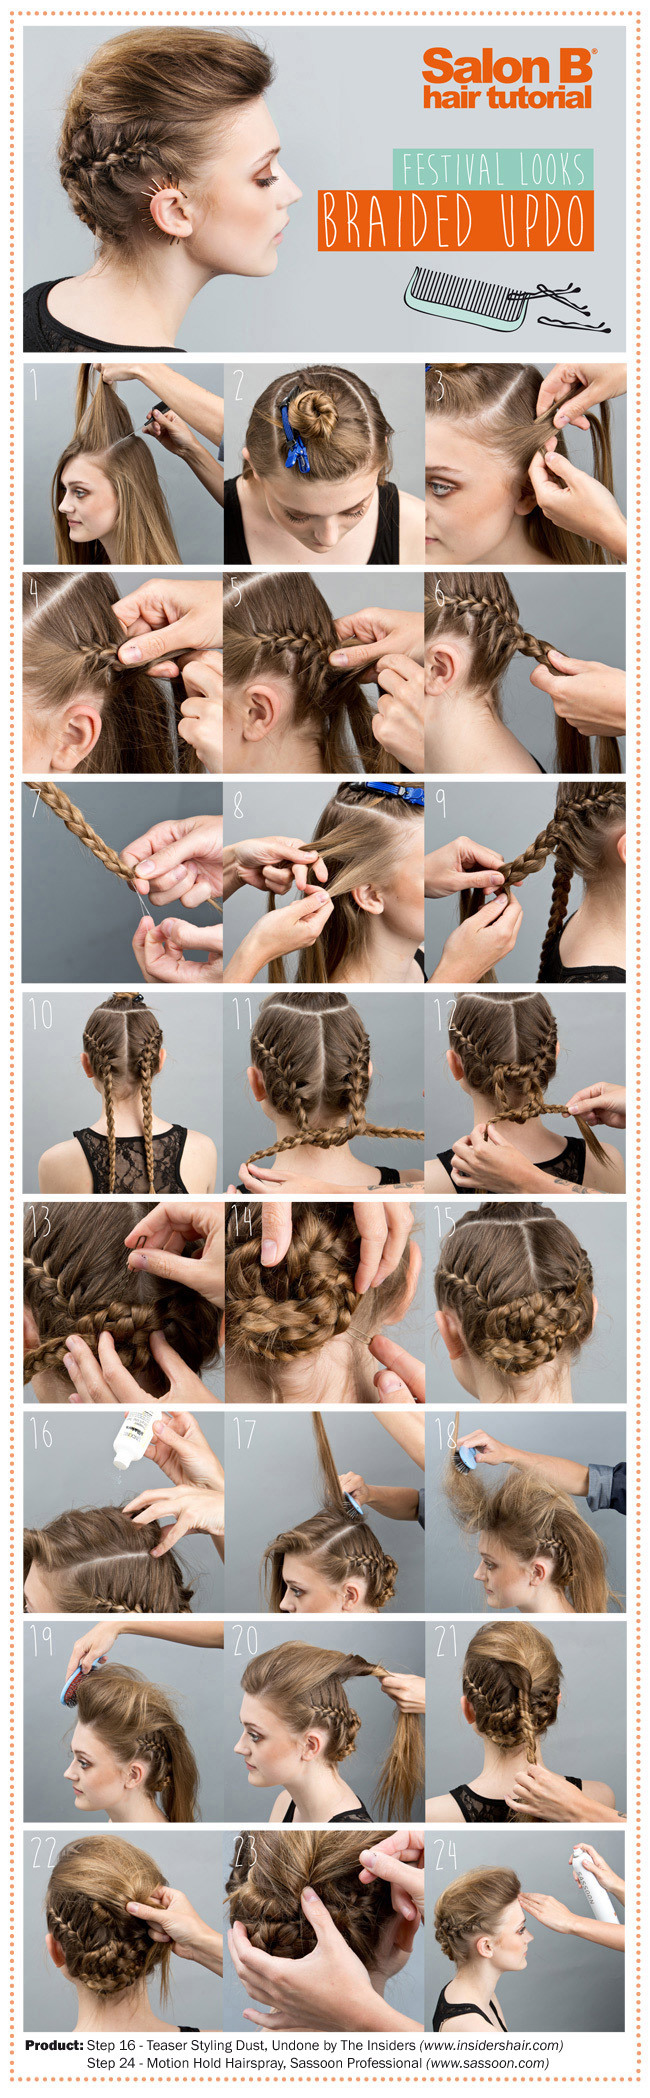 festival-hair-tutorial_braided-updo_salonb